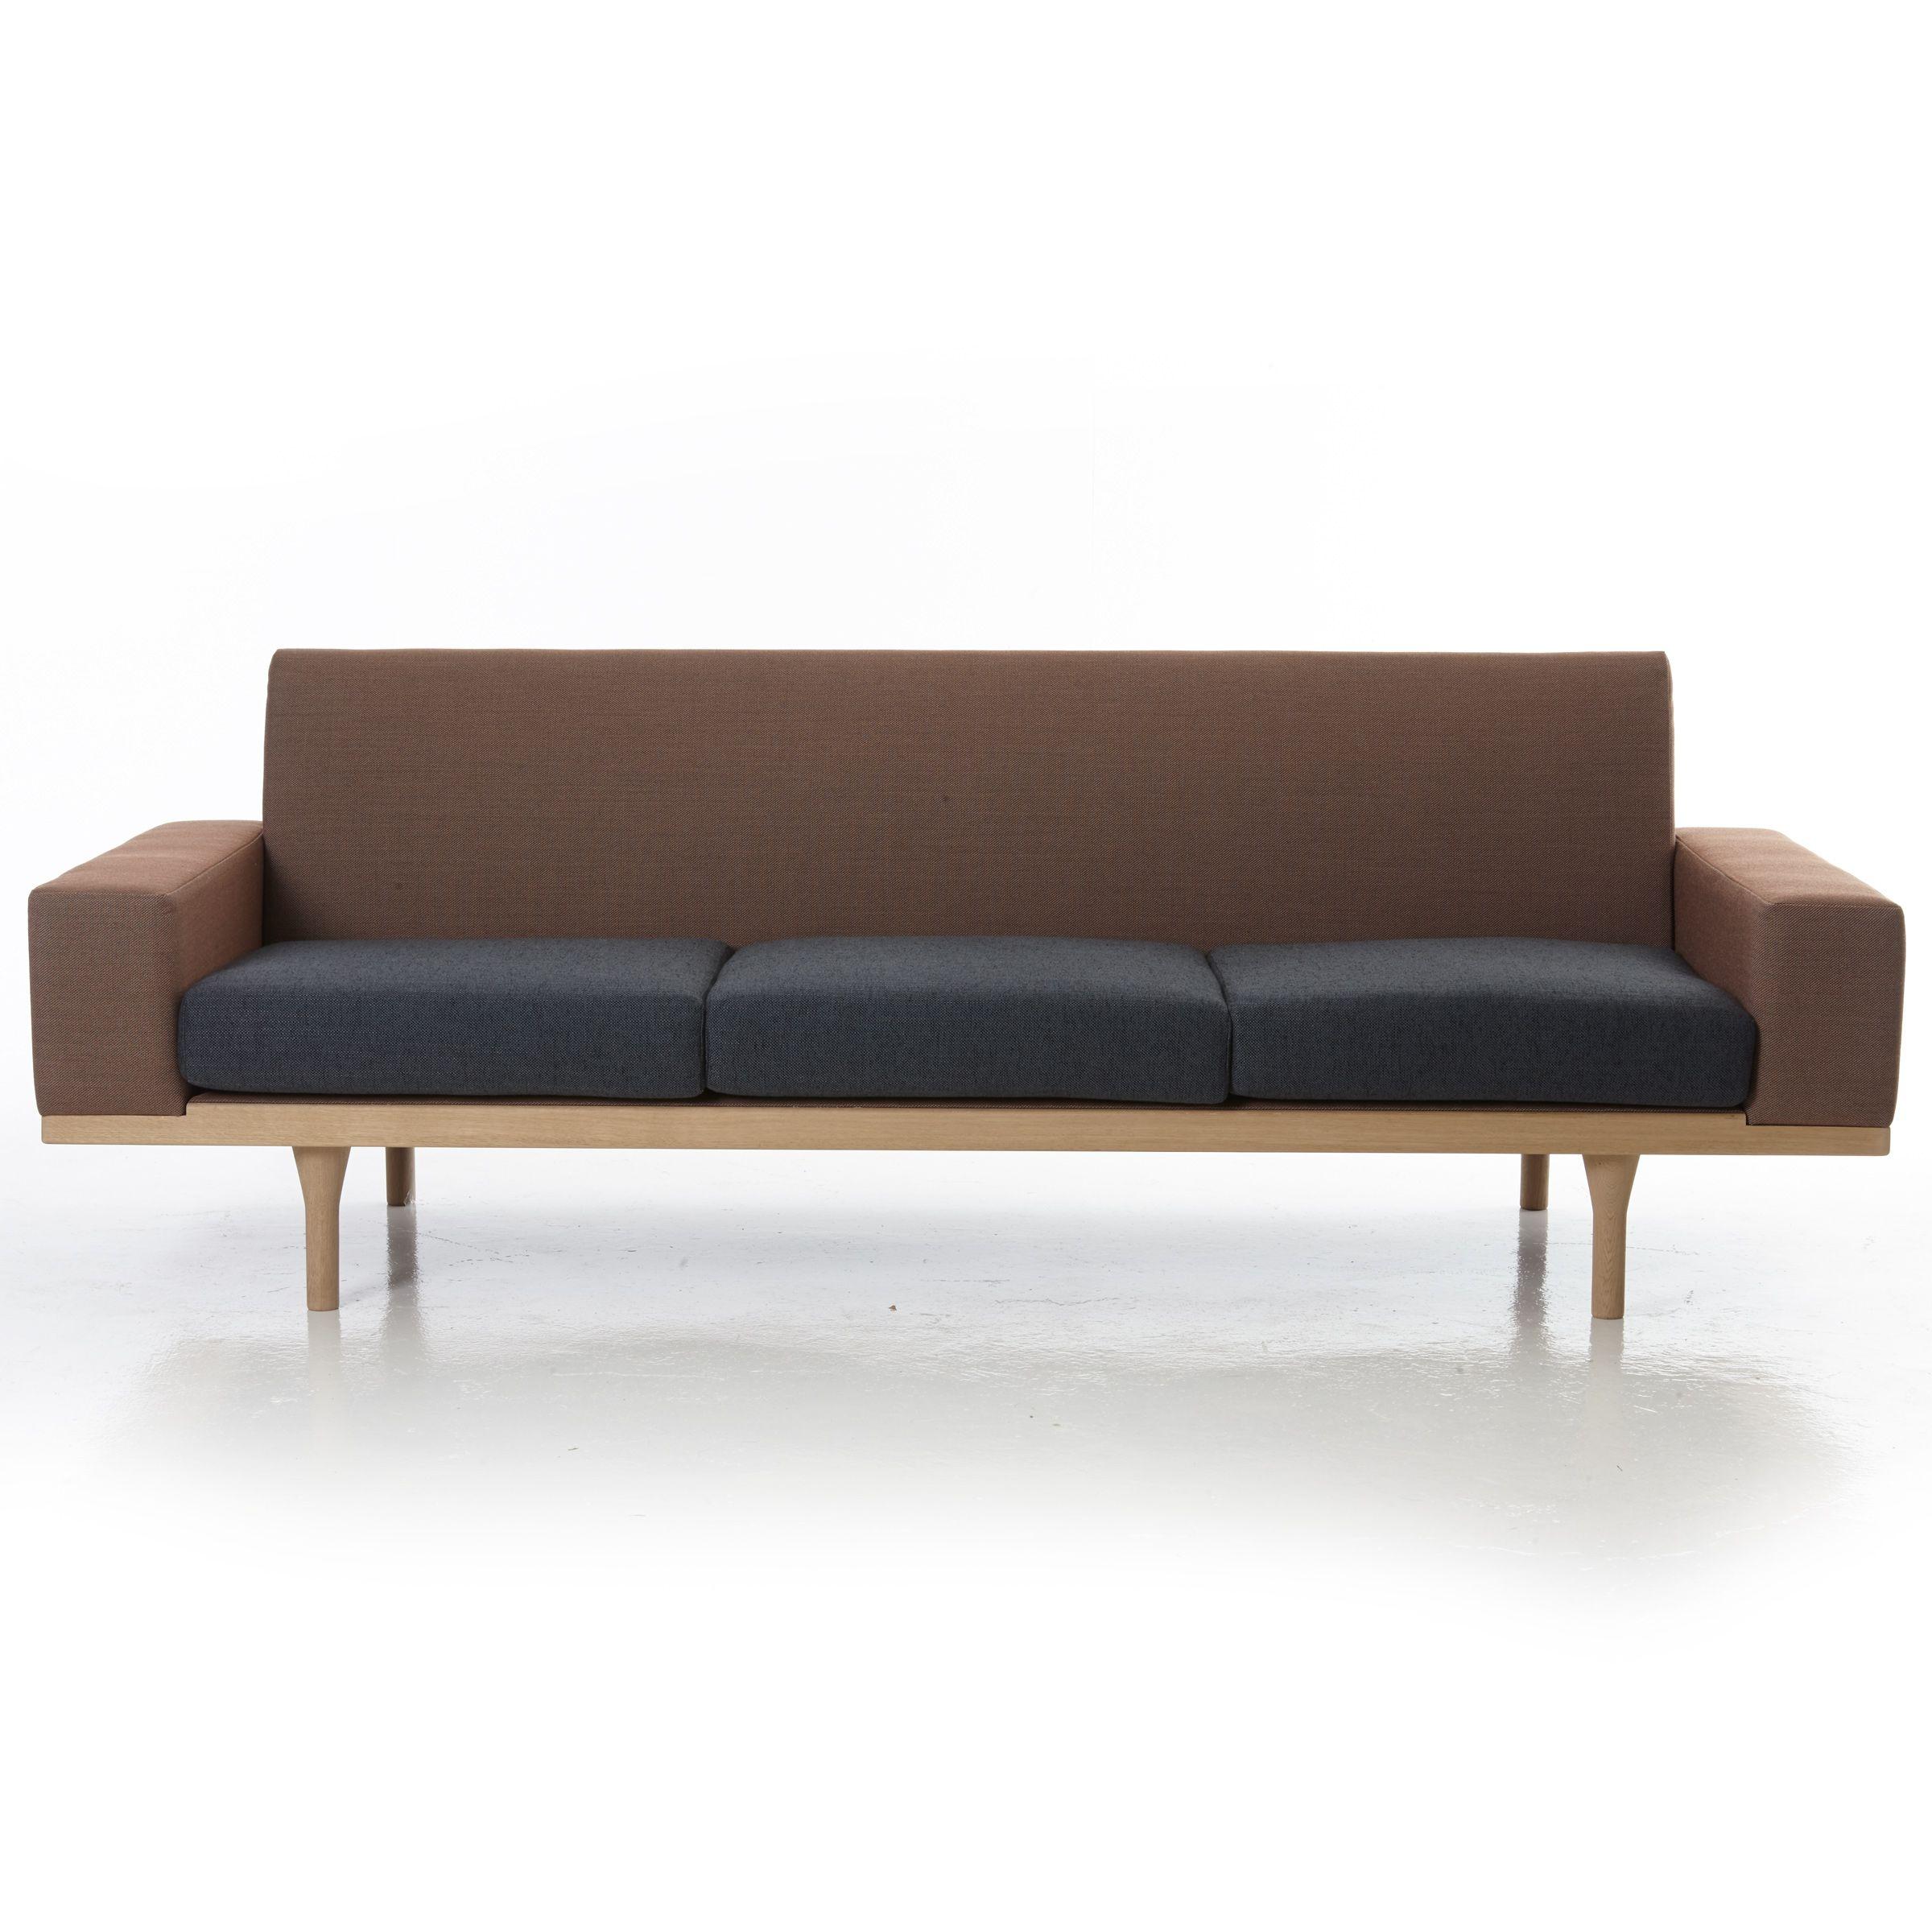 Illum Wikkelso Australia Sofa Three Seater Exclusive To Great Dane.